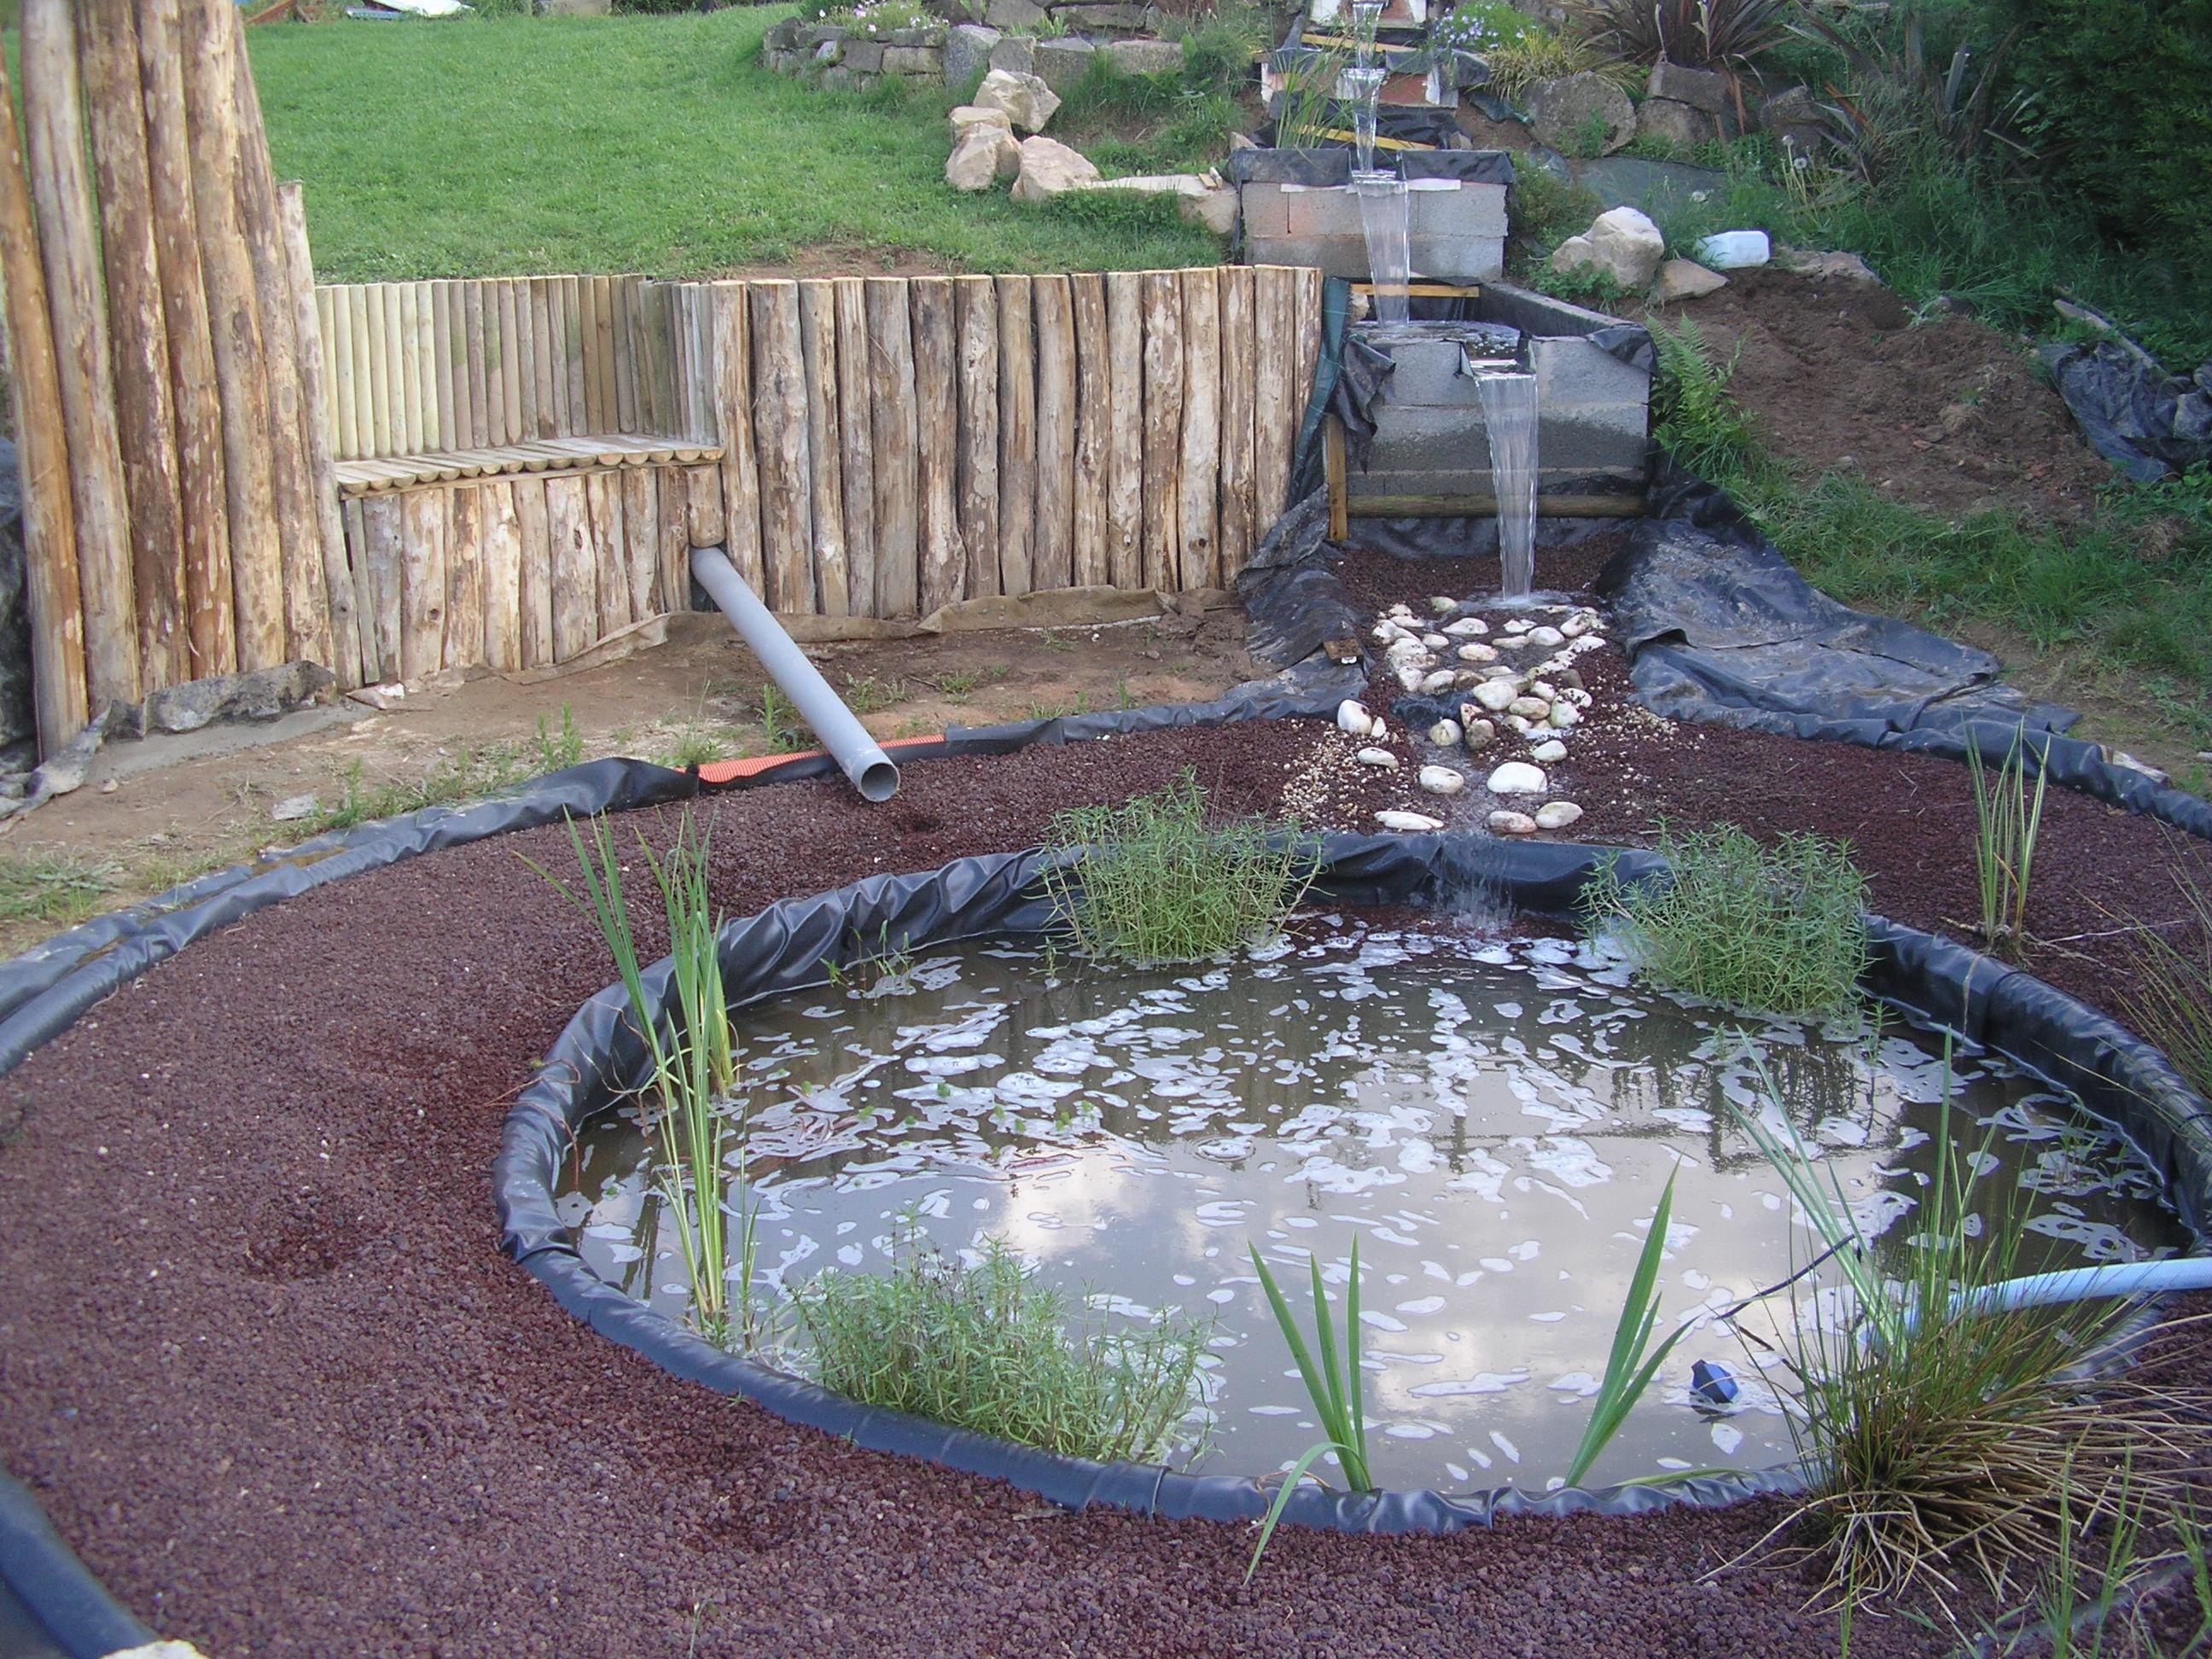 Modèle De Bassin De Jardin en ce qui concerne photo de bassin de jardin avec cascade - fashion designs